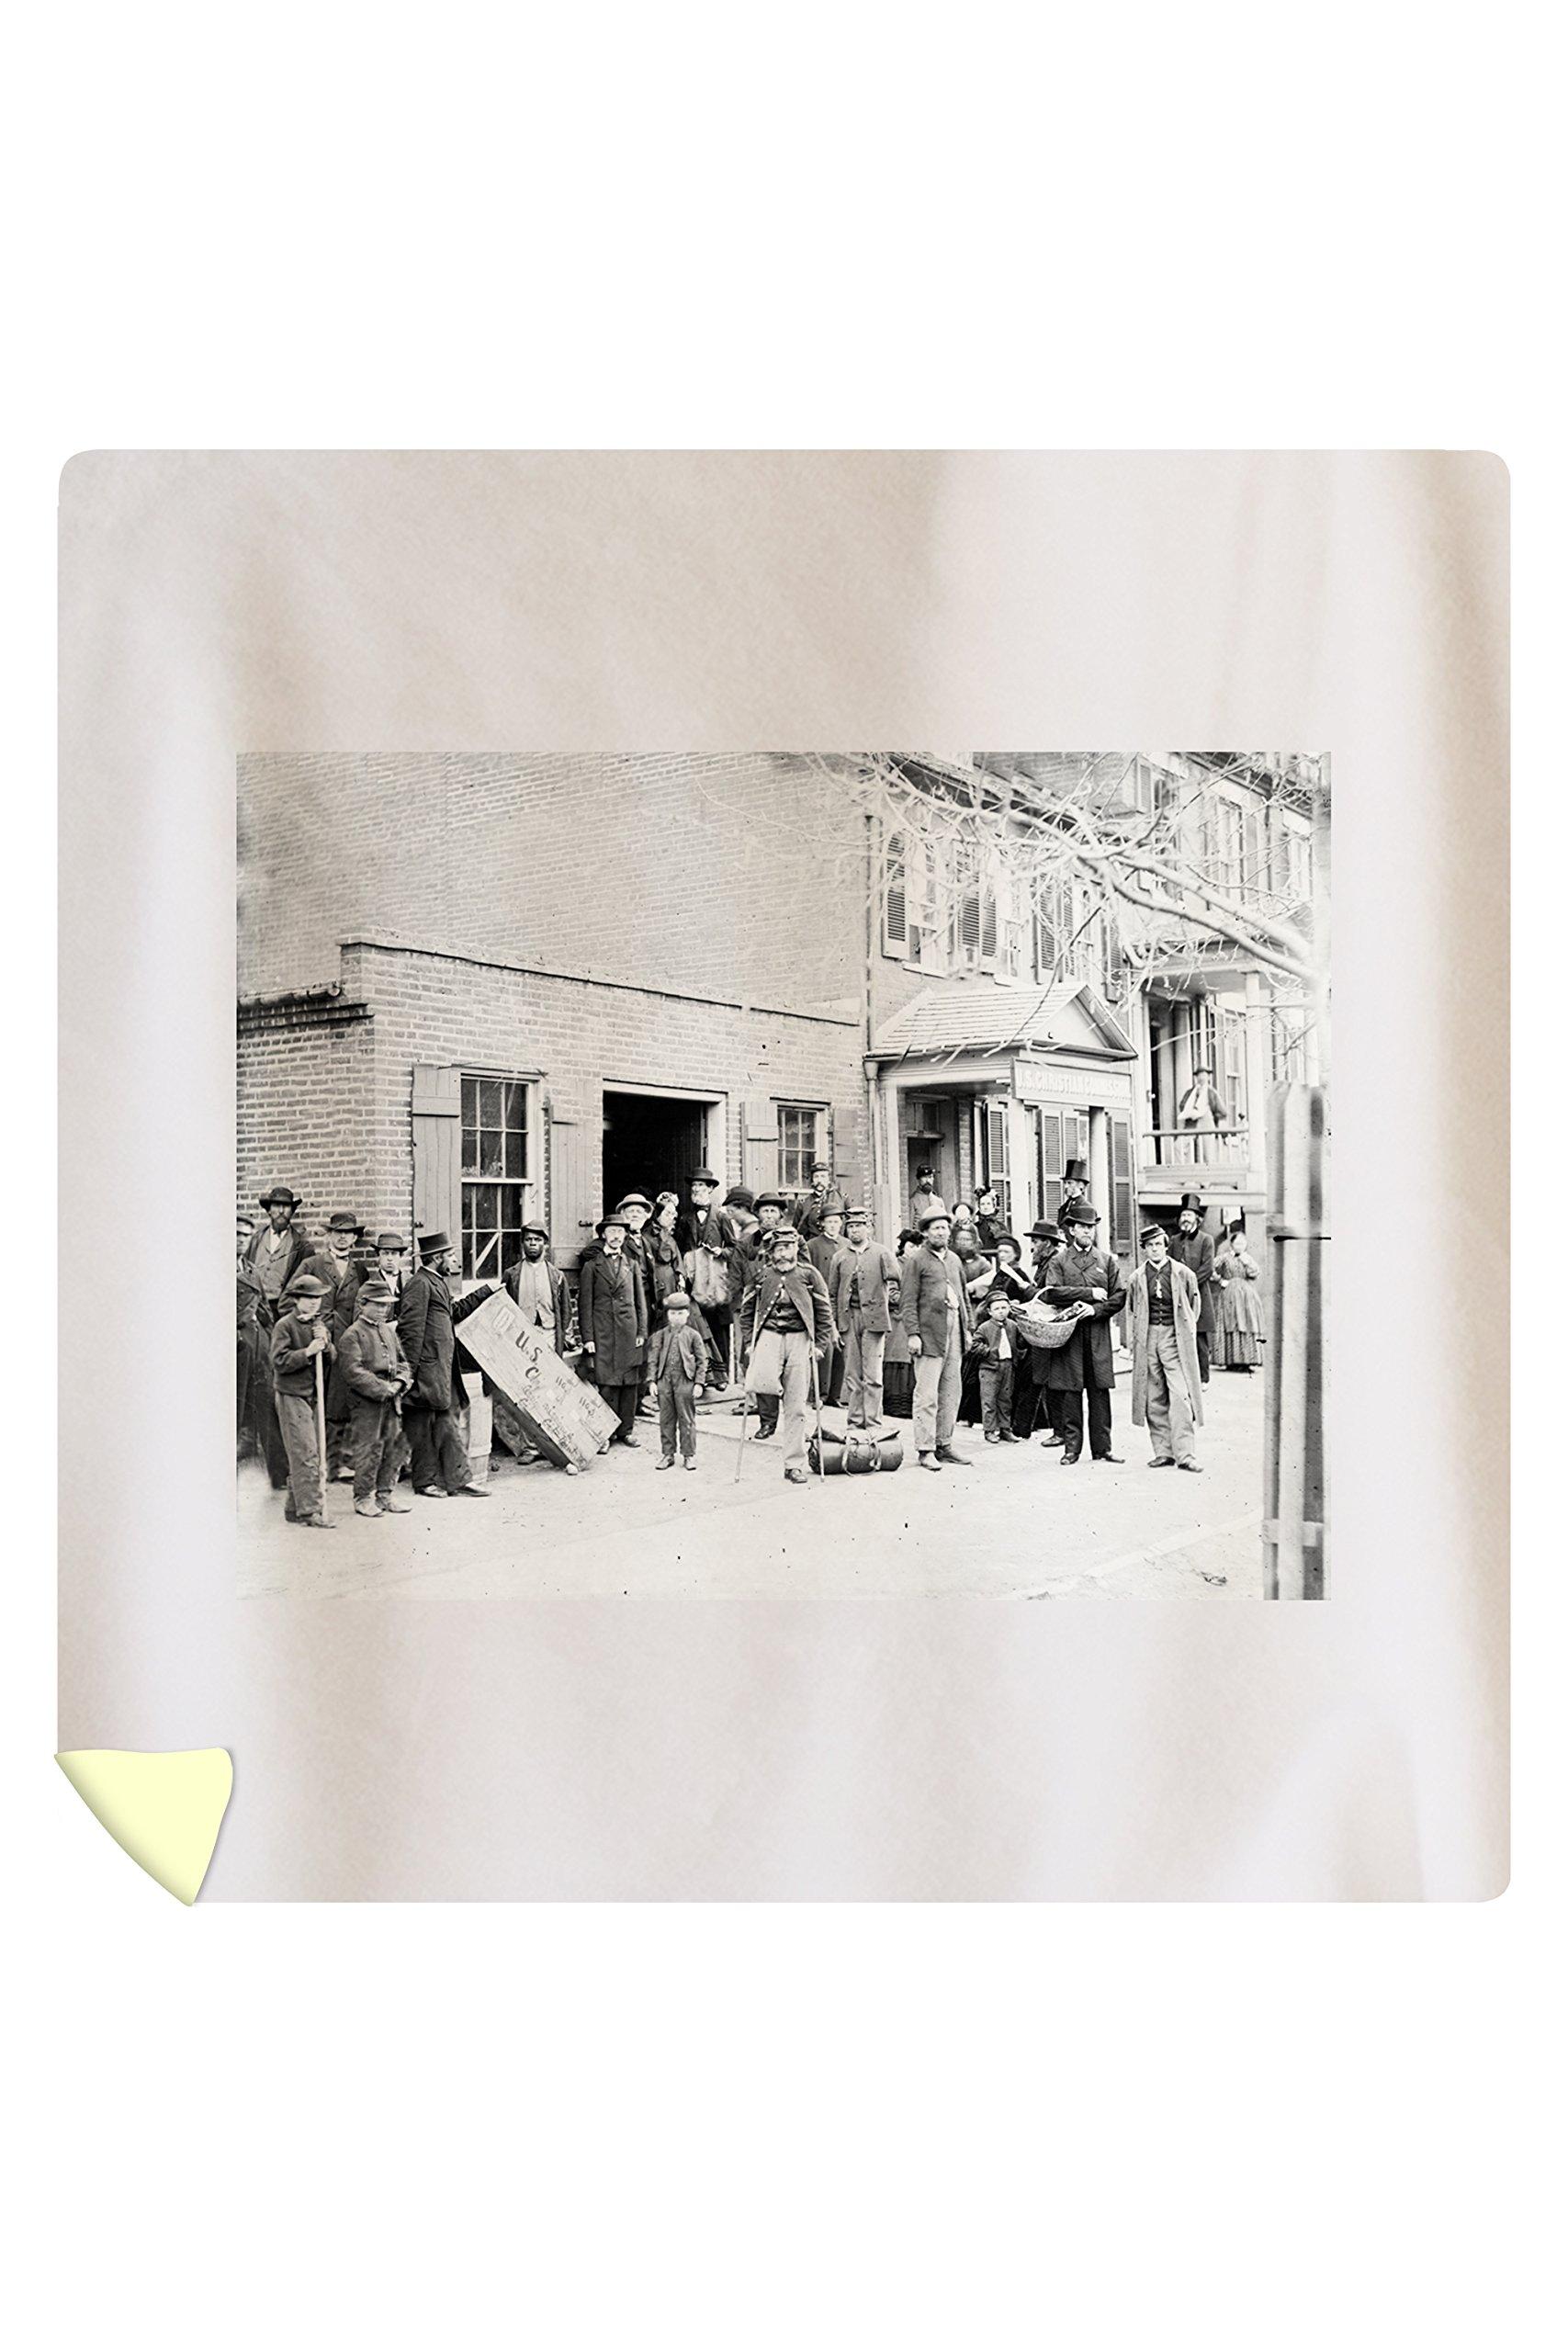 Washington, DC - Maimed Soldiers at U.S. Christian Commission Civil War Photograph (88x88 Queen Microfiber Duvet Cover) by Lantern Press